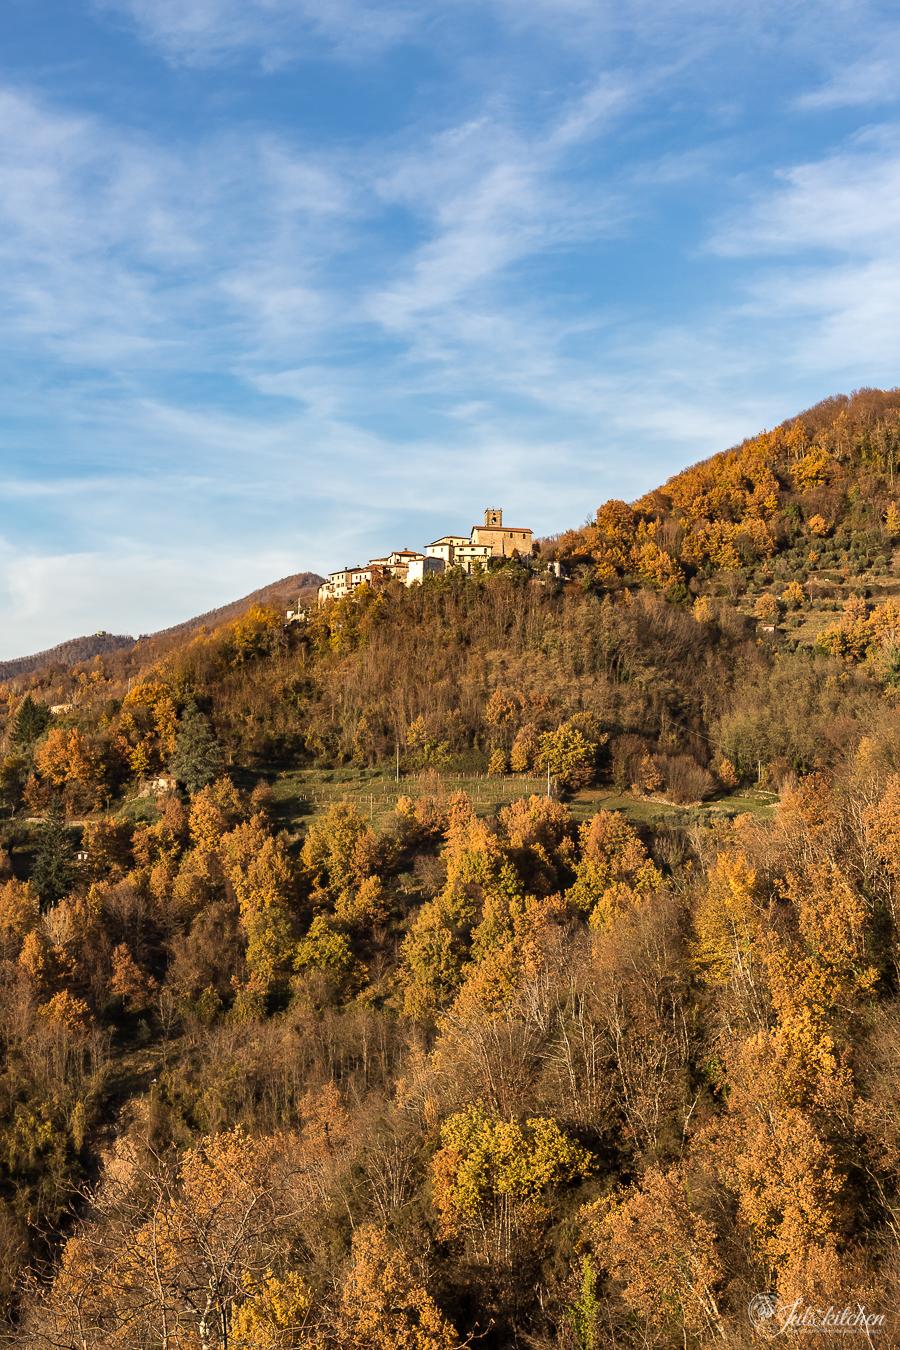 A Weekend In Garfagnana And A Video Recipe